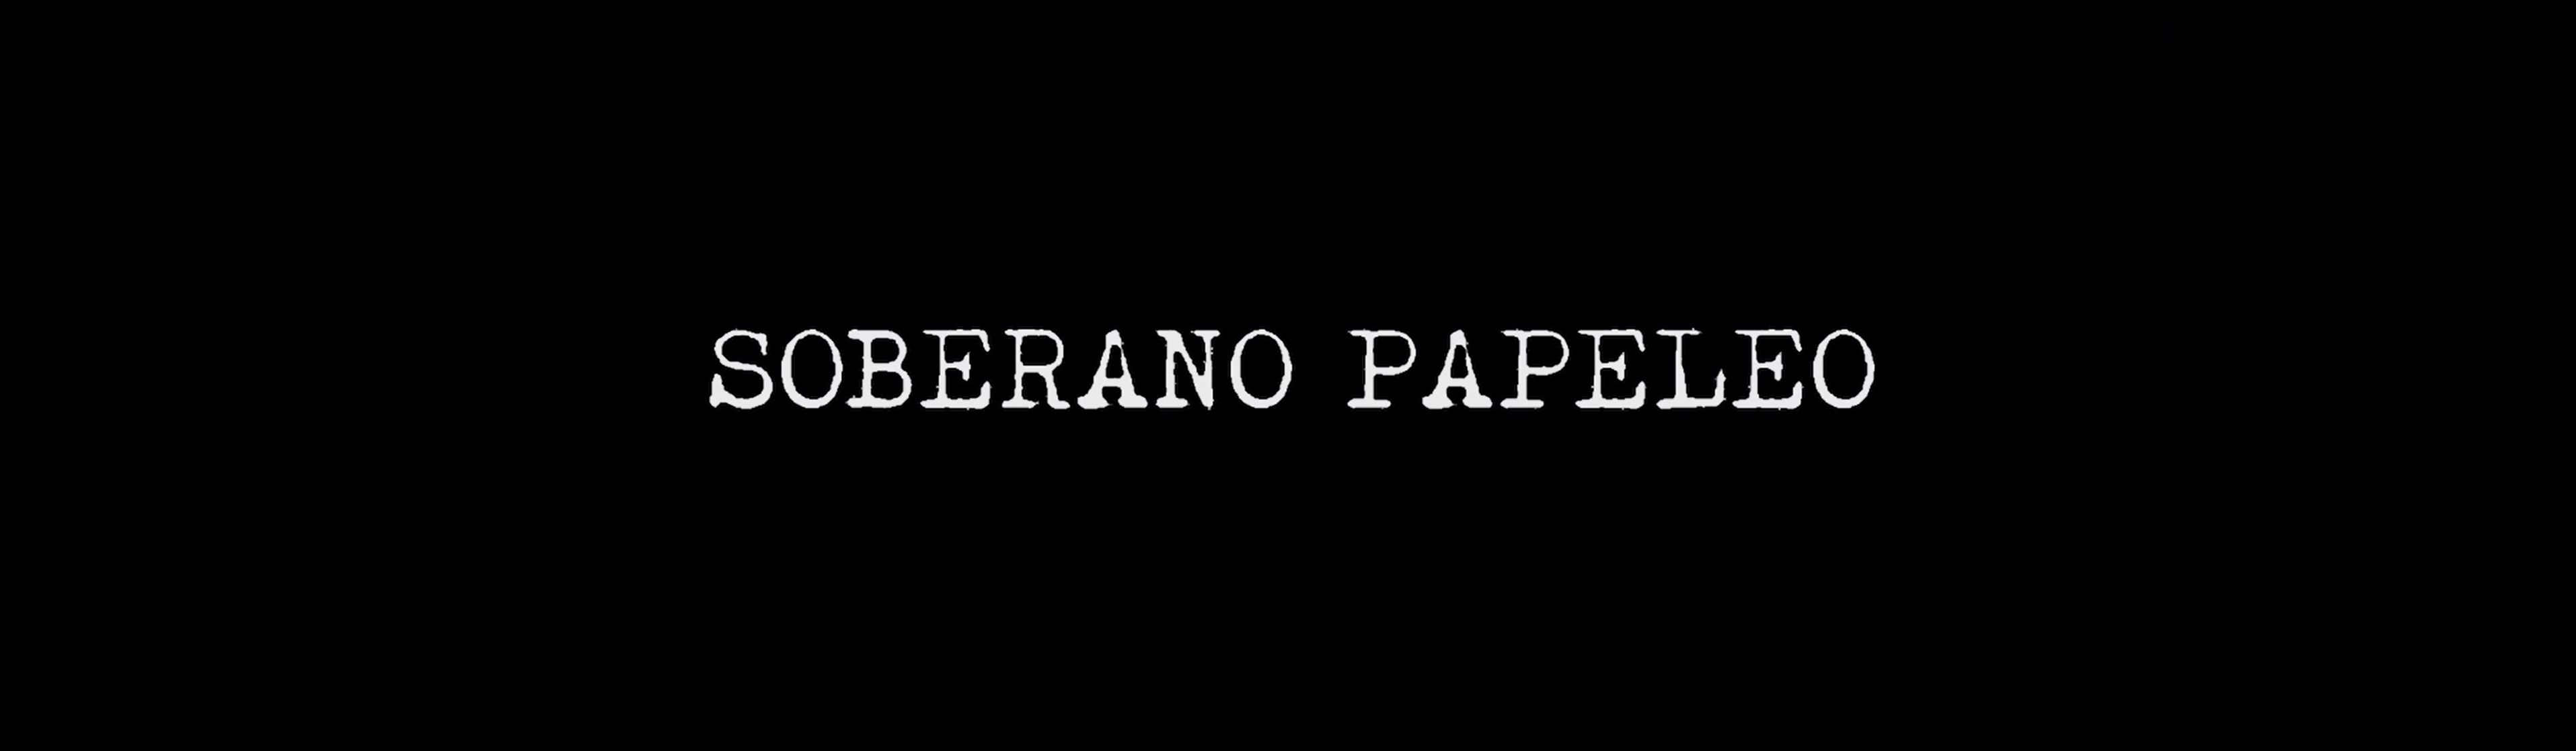 SOVEREIGN PAPERWORK / SOBERANO PAPELEO